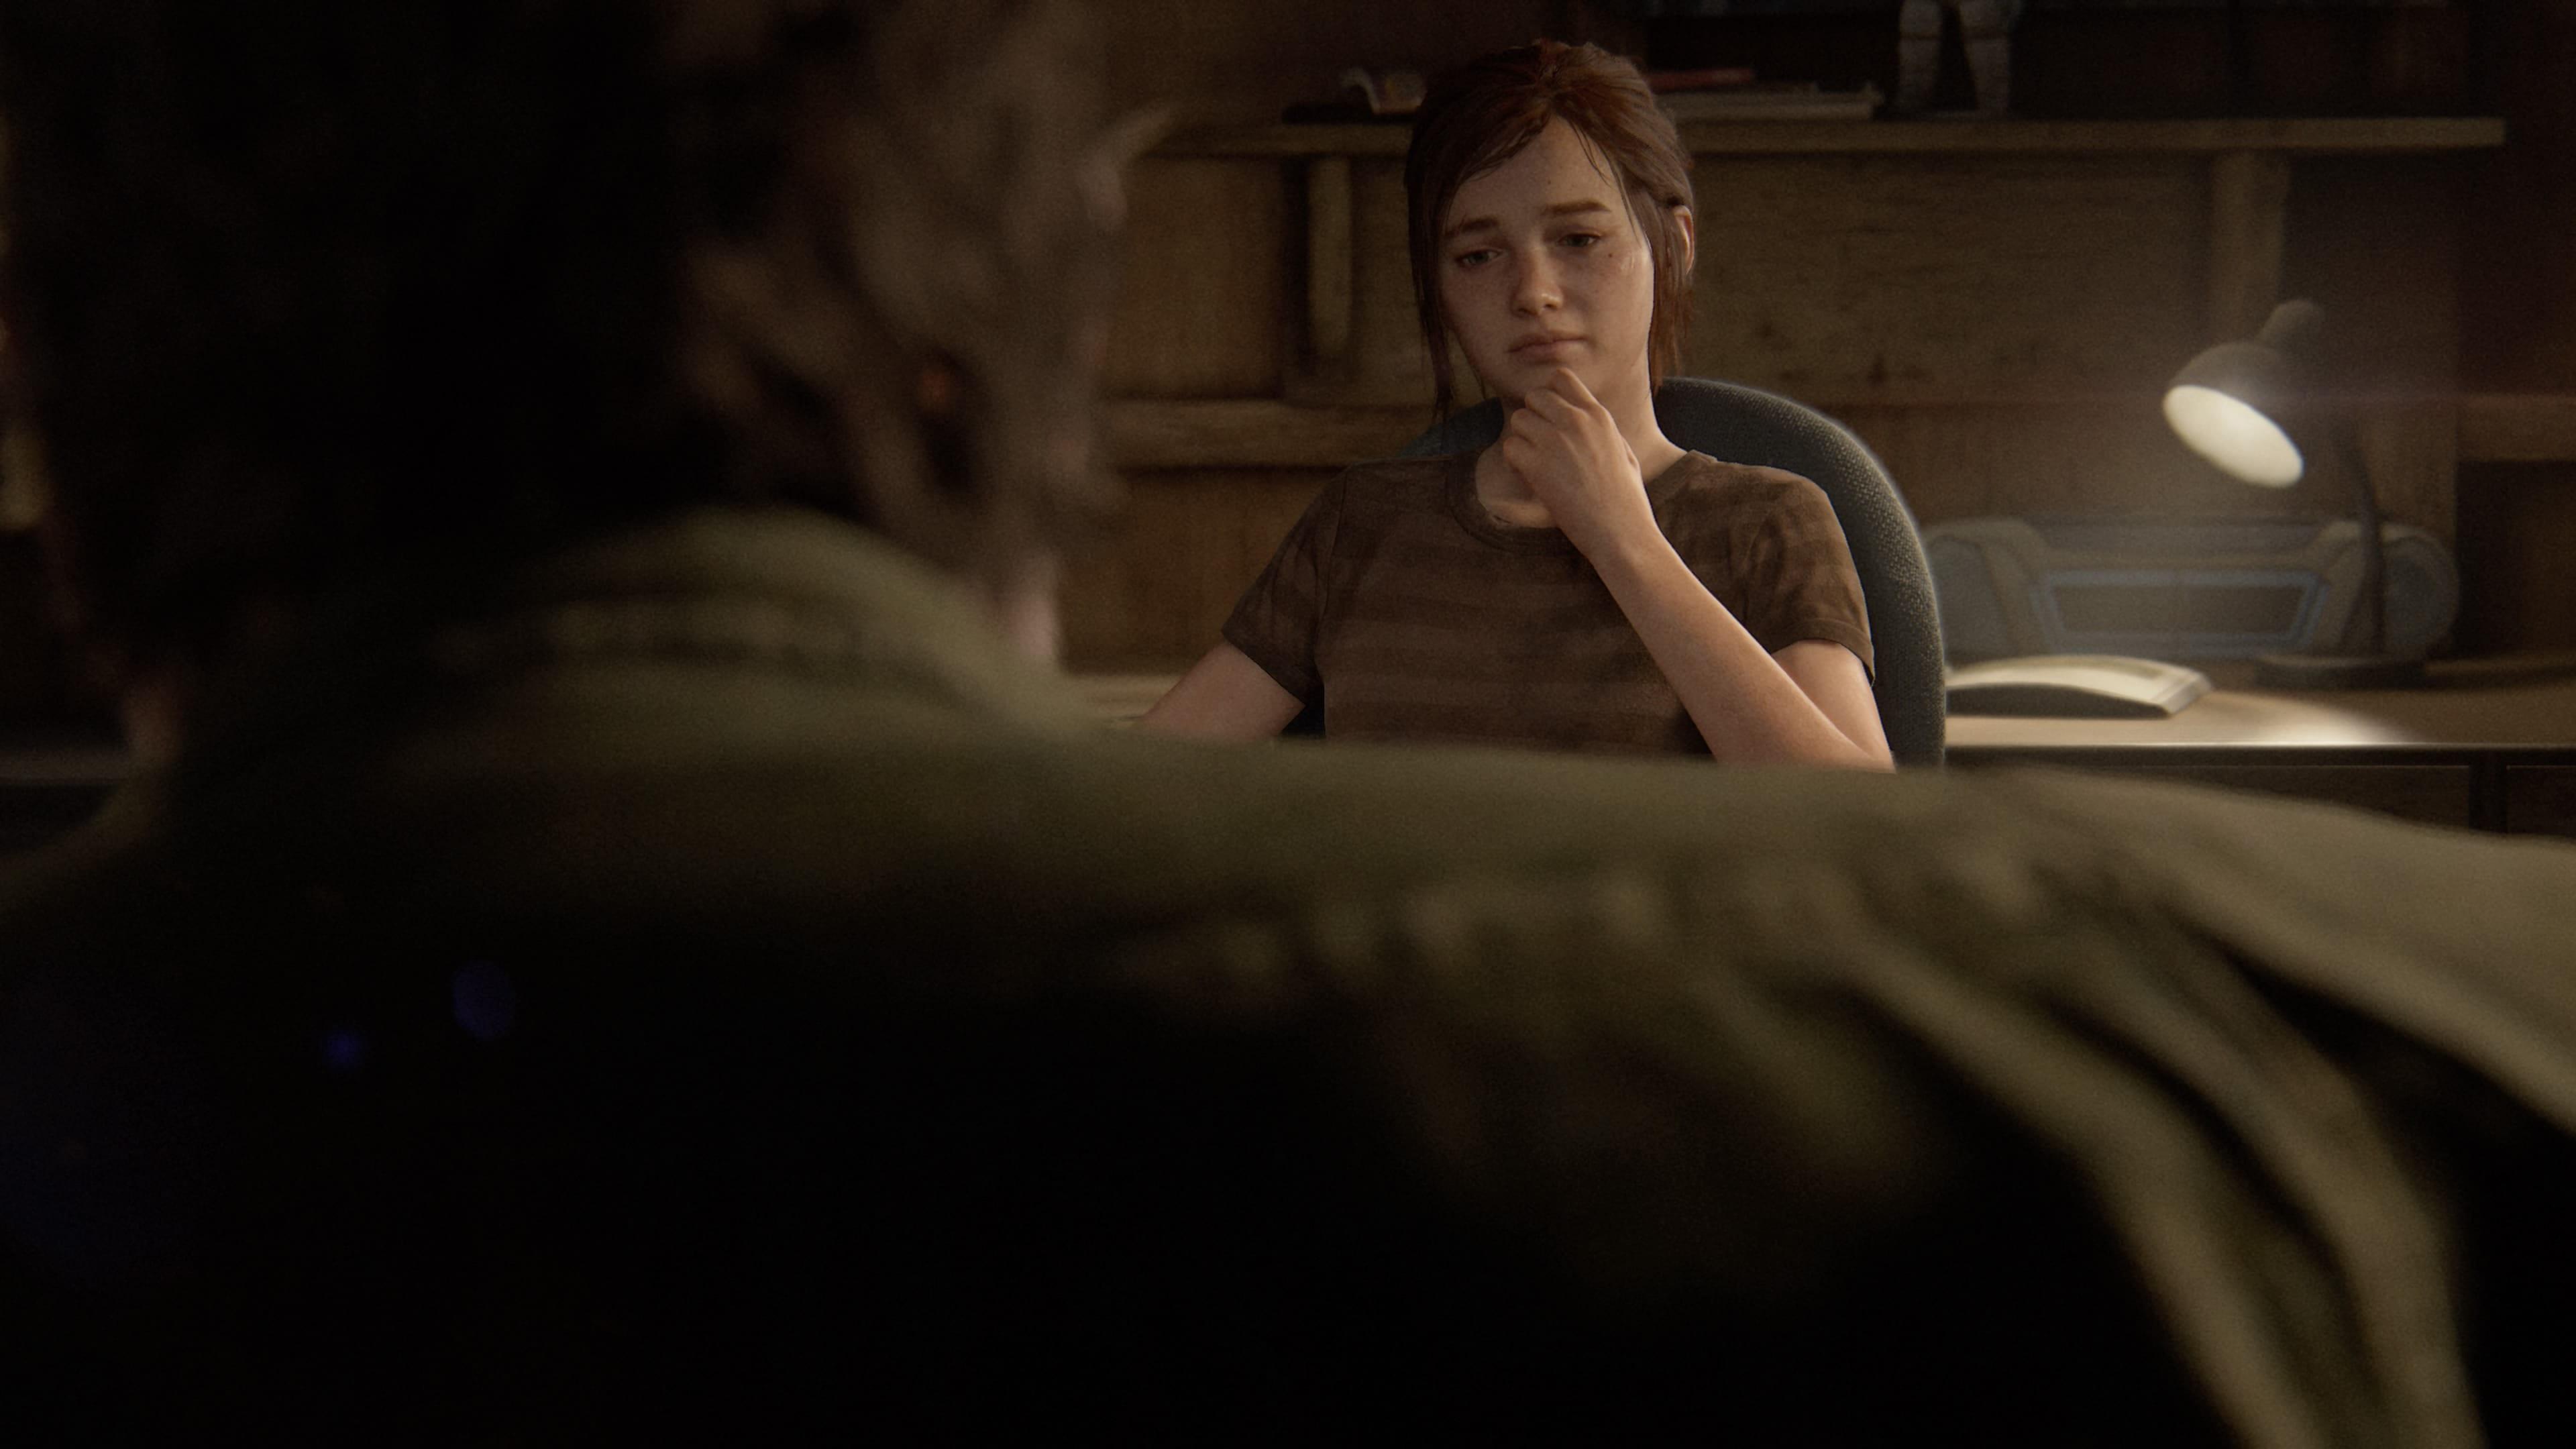 The Last of Us 2 Alternatives Ende Erbarmungslos